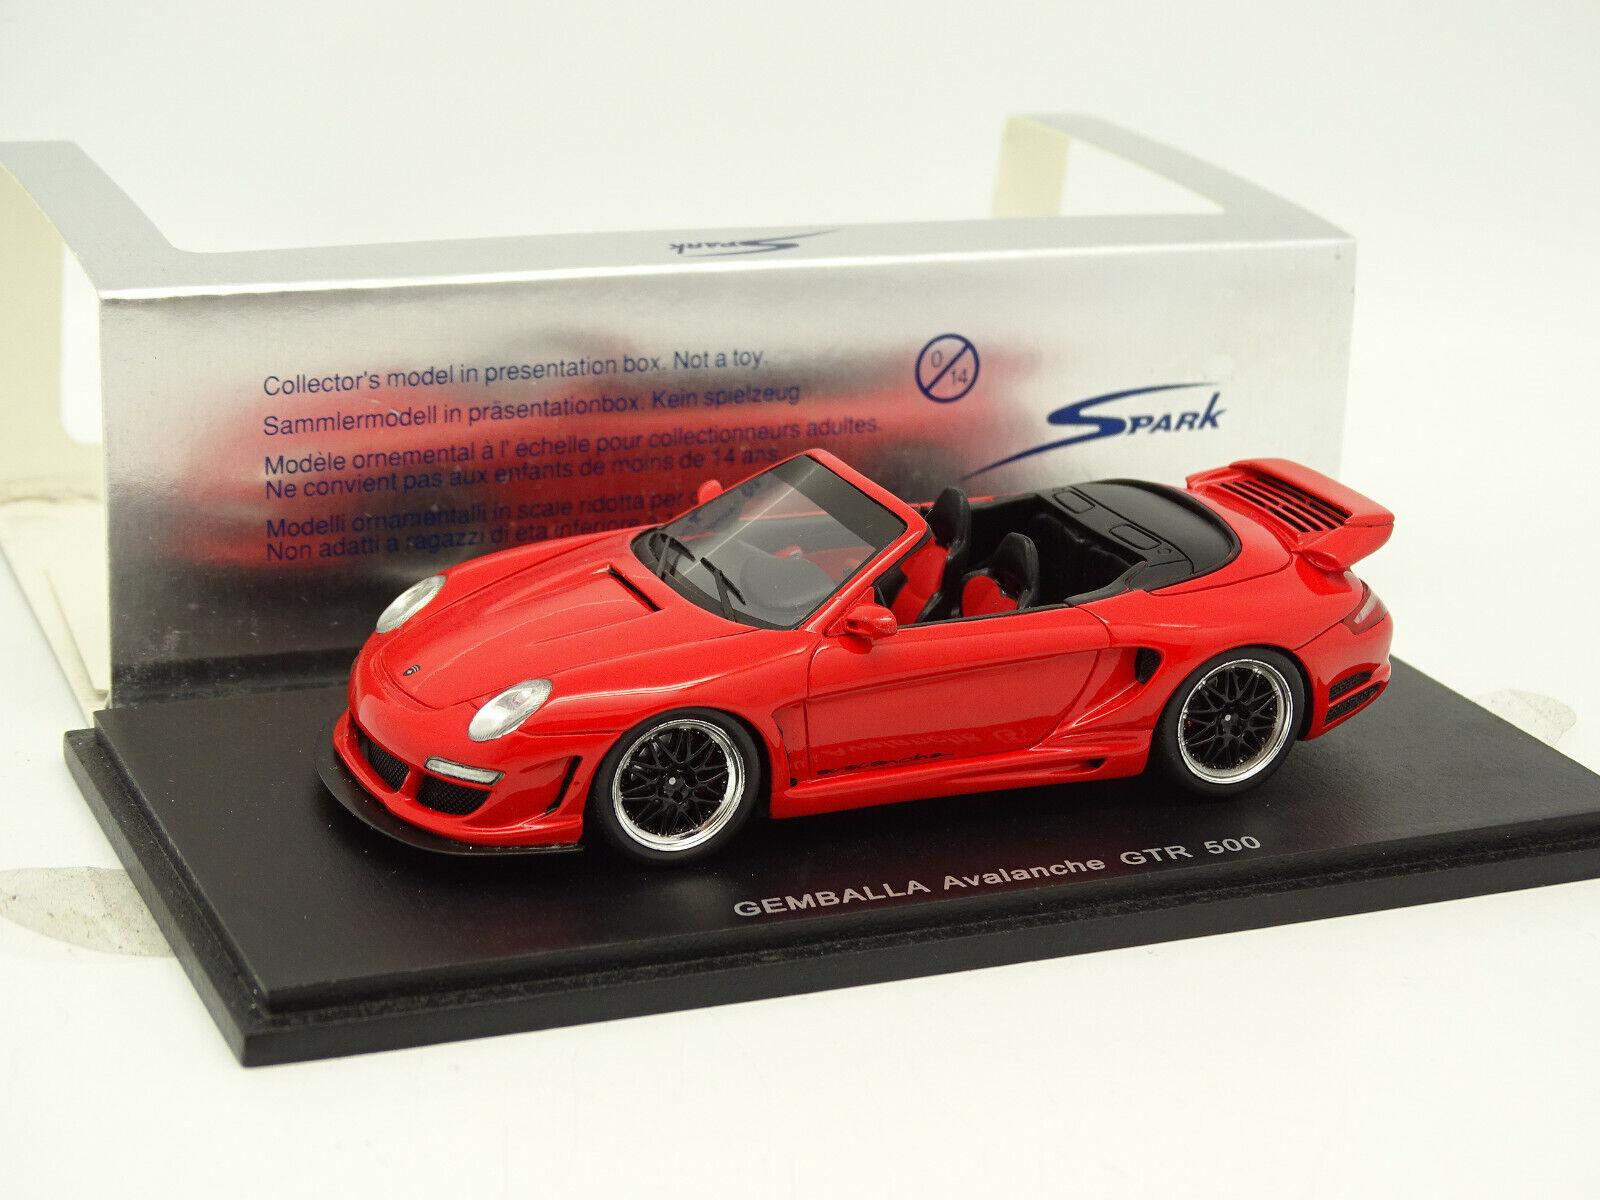 Spark 1 43 - Porsche Gemballa Avalanche GTR 500 rosso